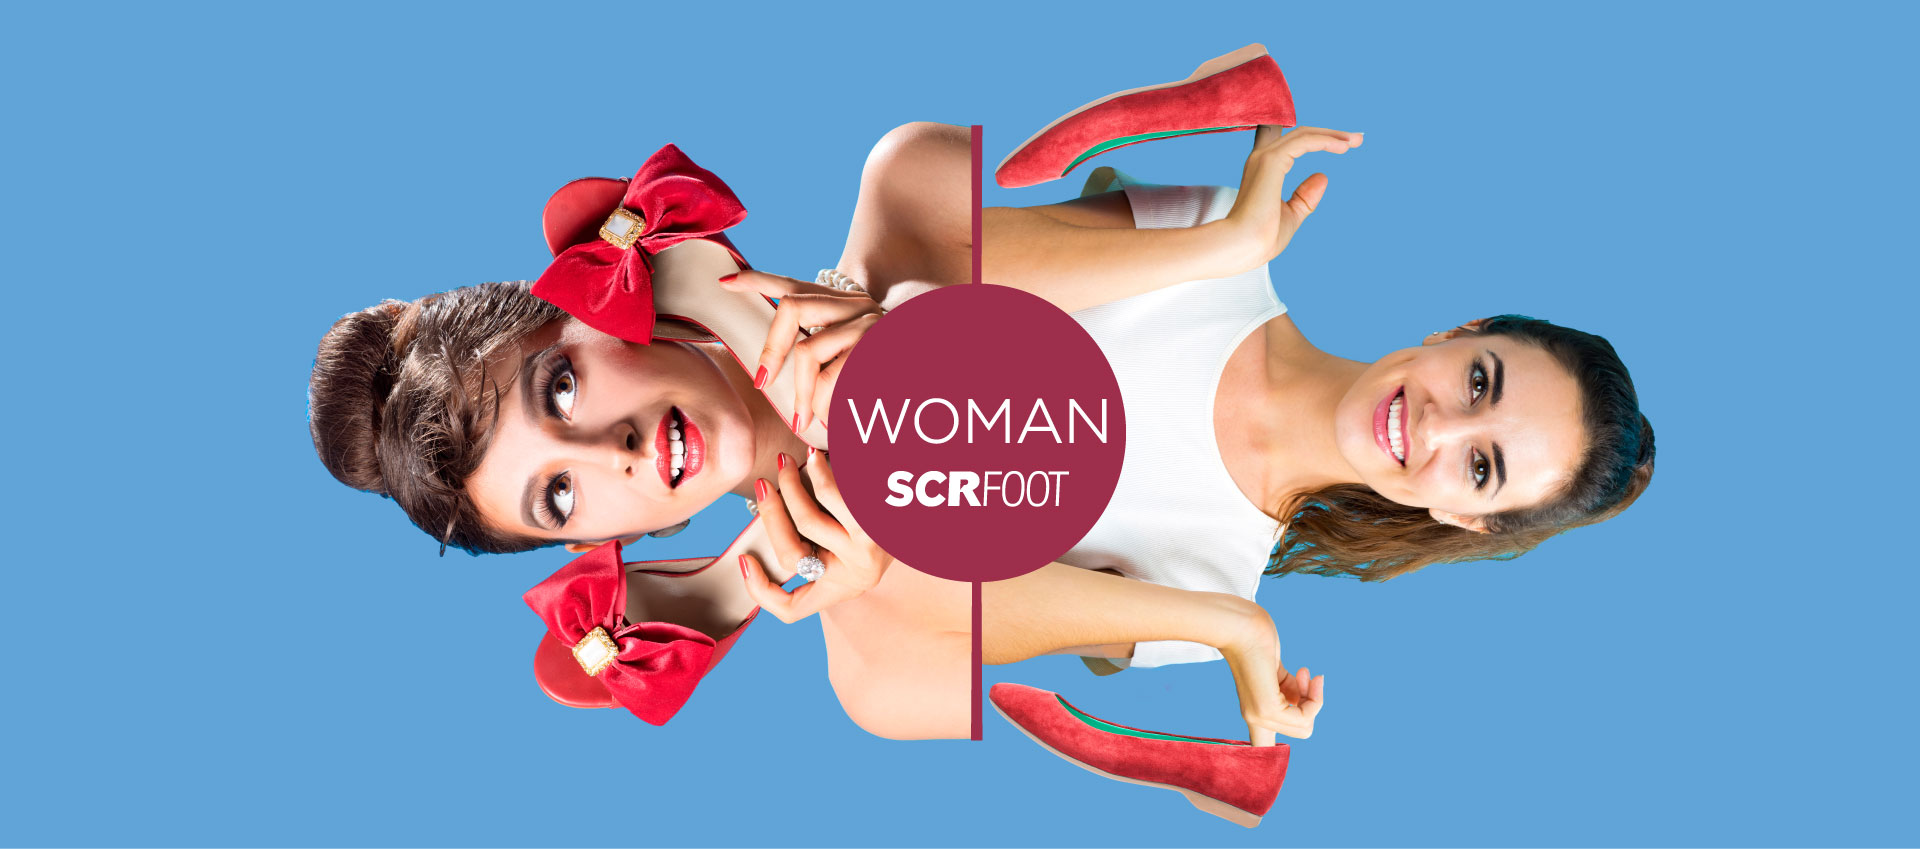 bg_scrfoot_lineawoman